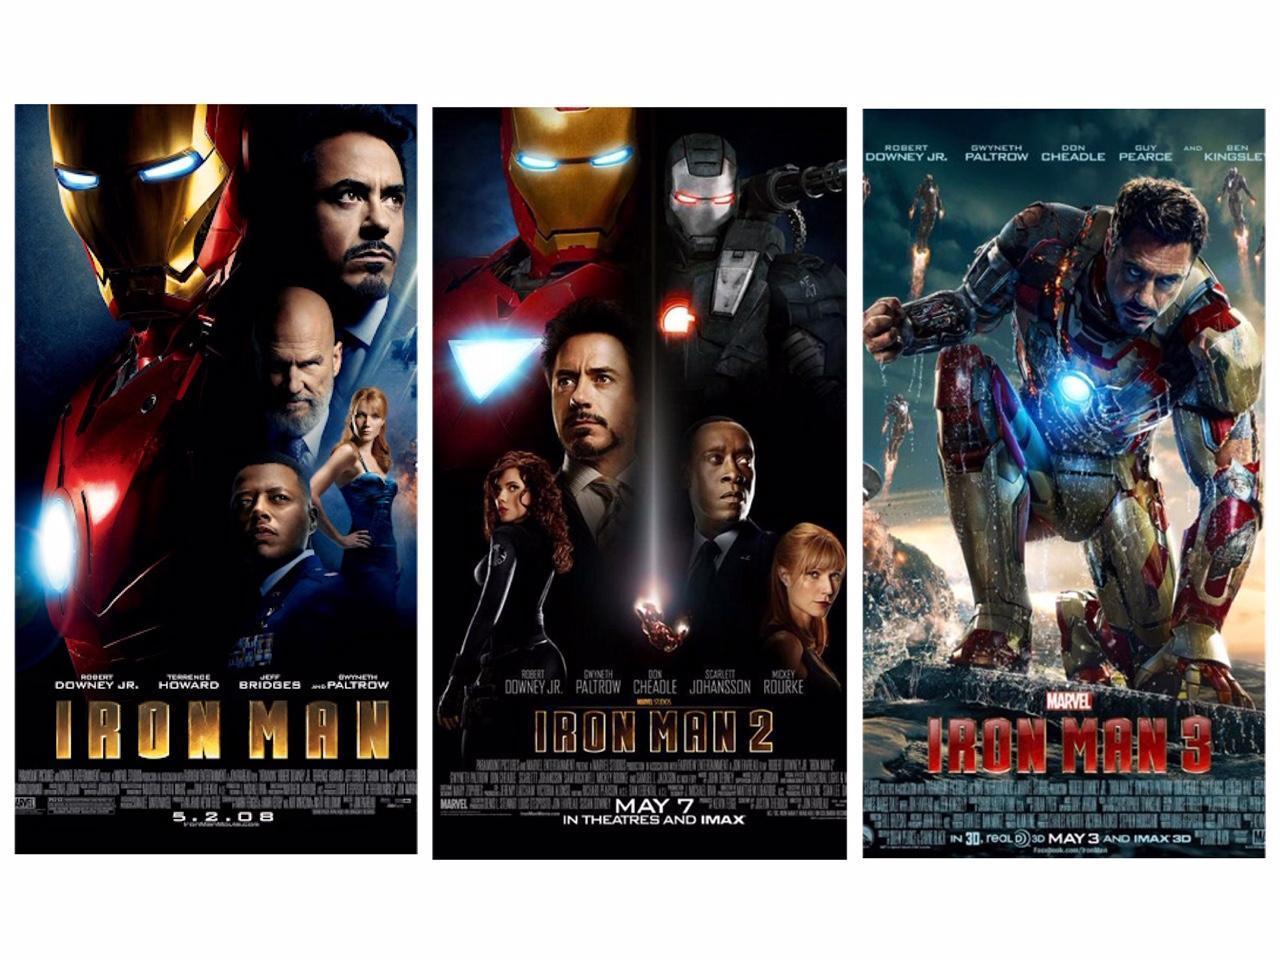 3. Iron Man